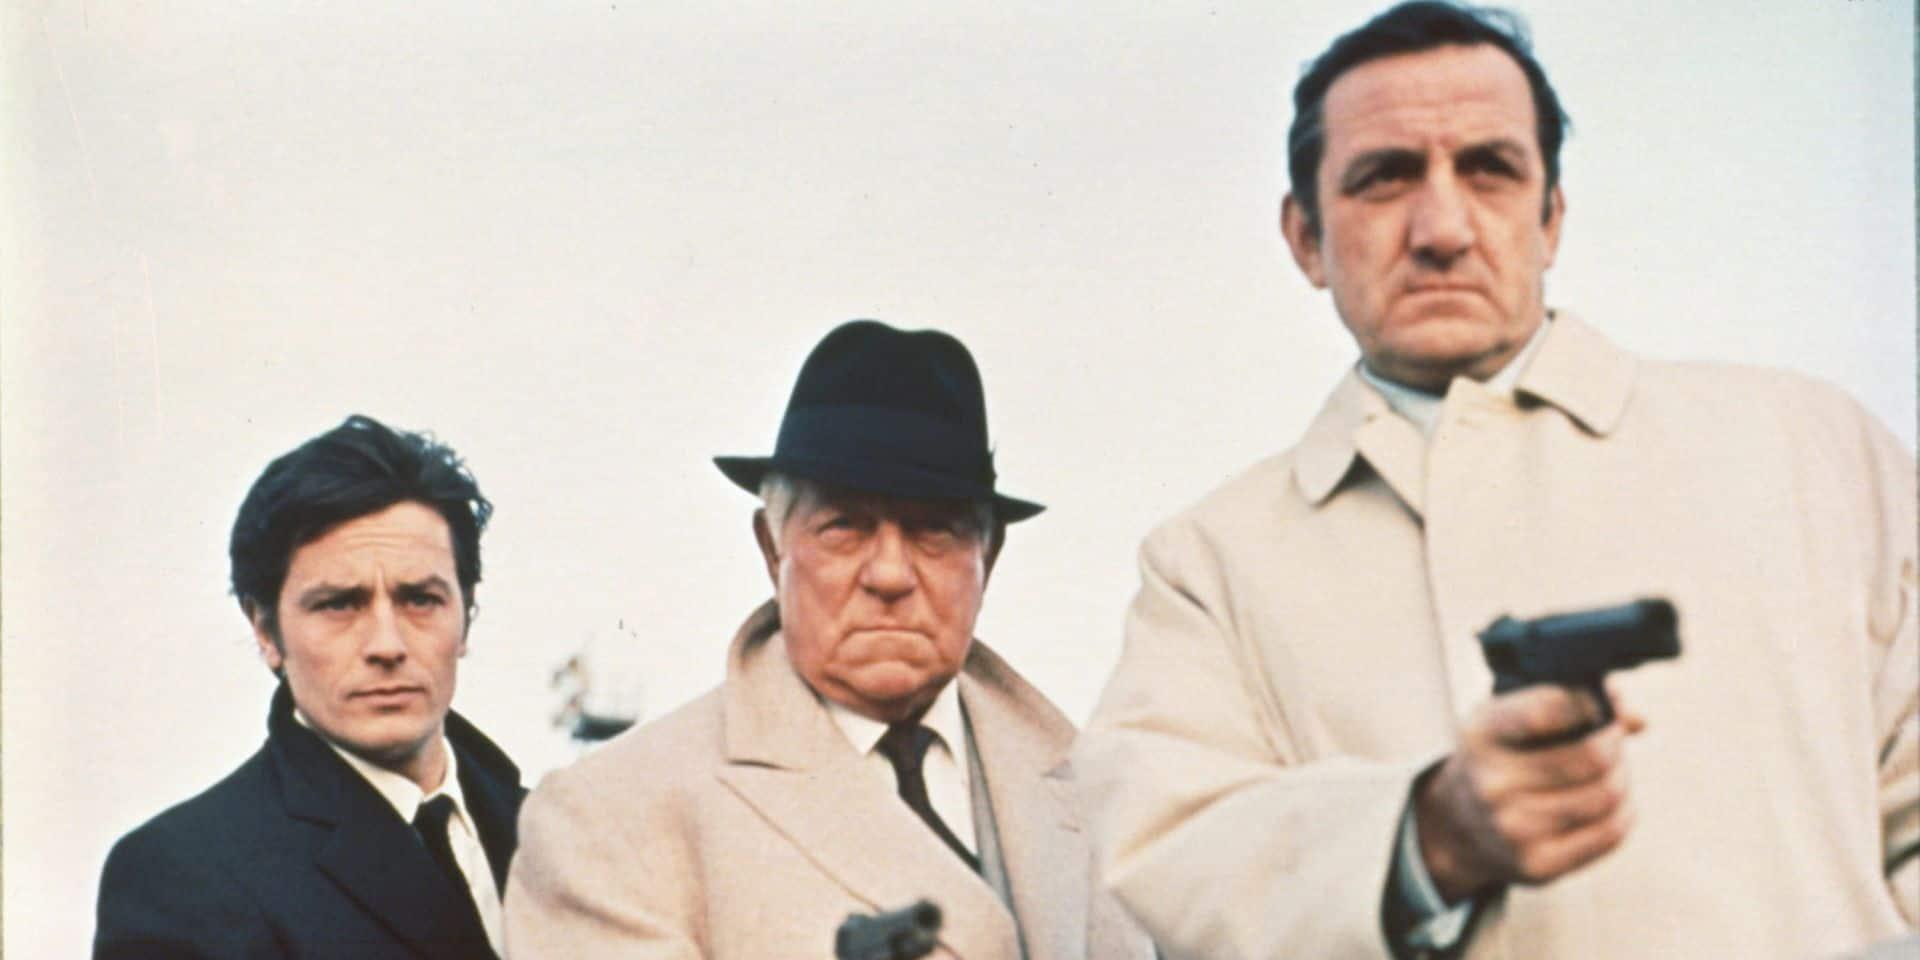 Gabin, Delon et Ventura, trois stars dociles... ensemble